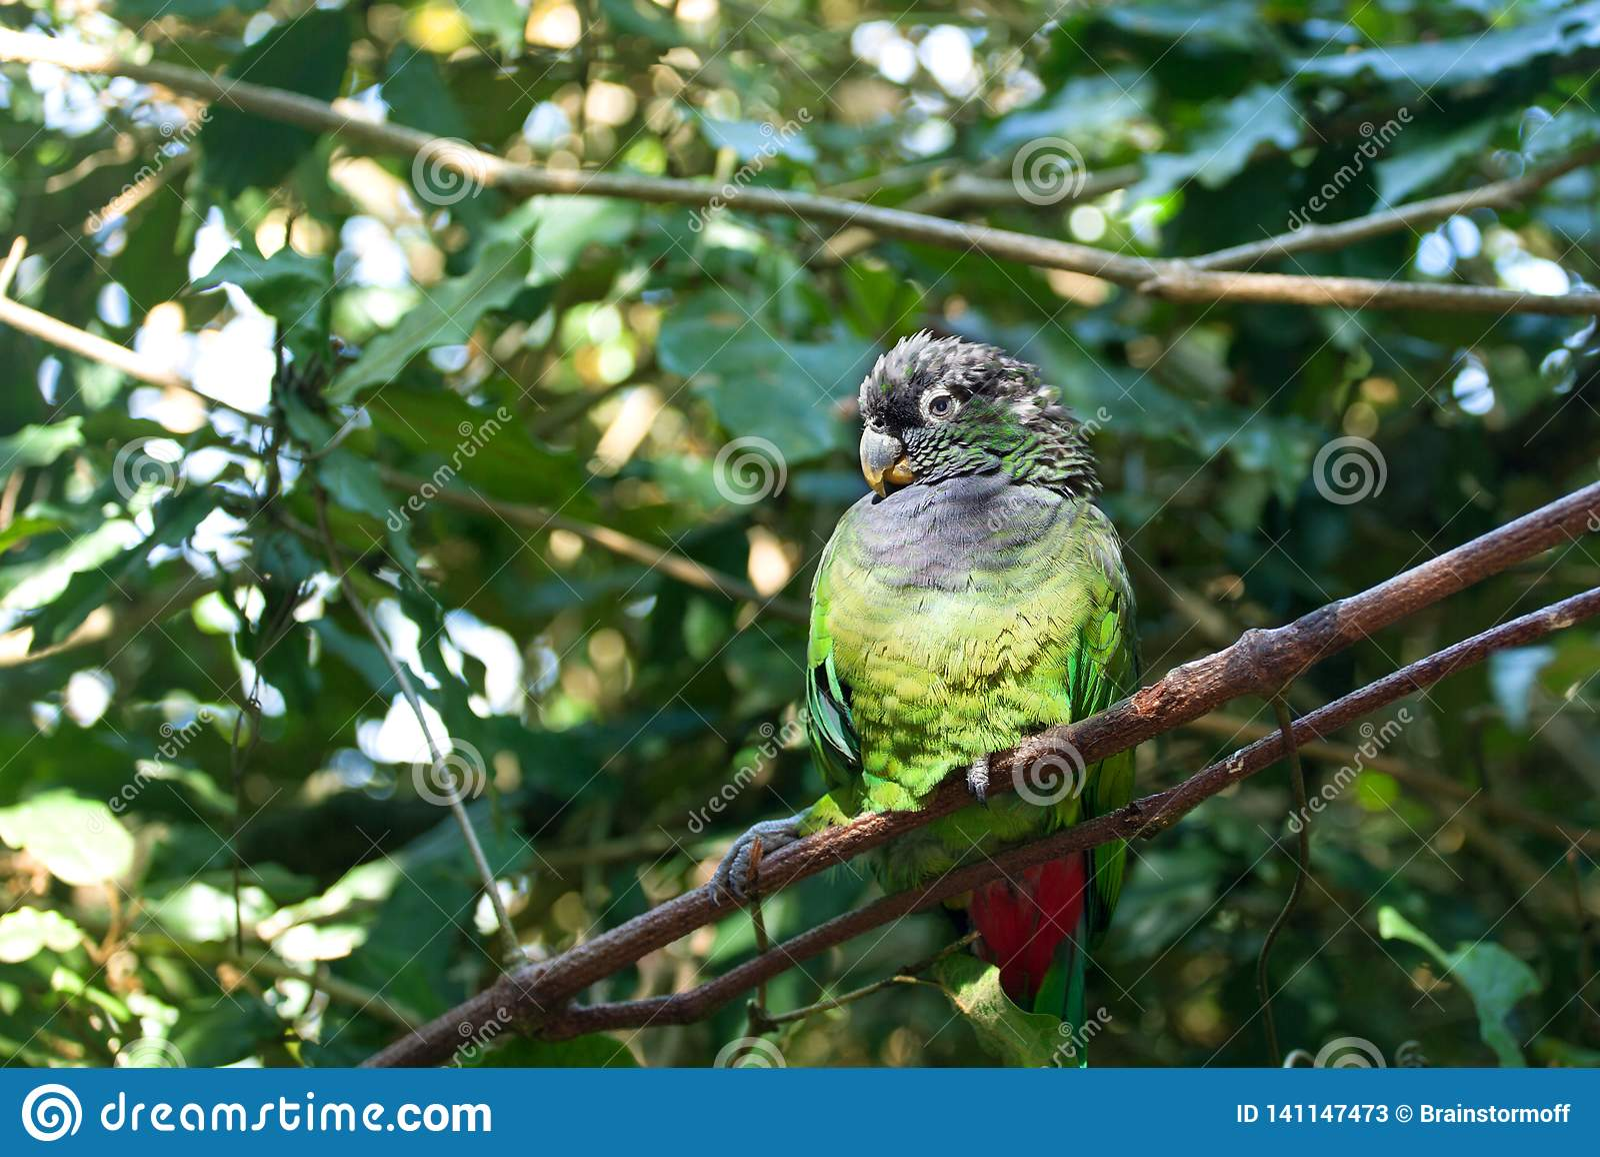 Green-cheeked parakeet conure or Pyrrhura molinae sitting on green tree background close up